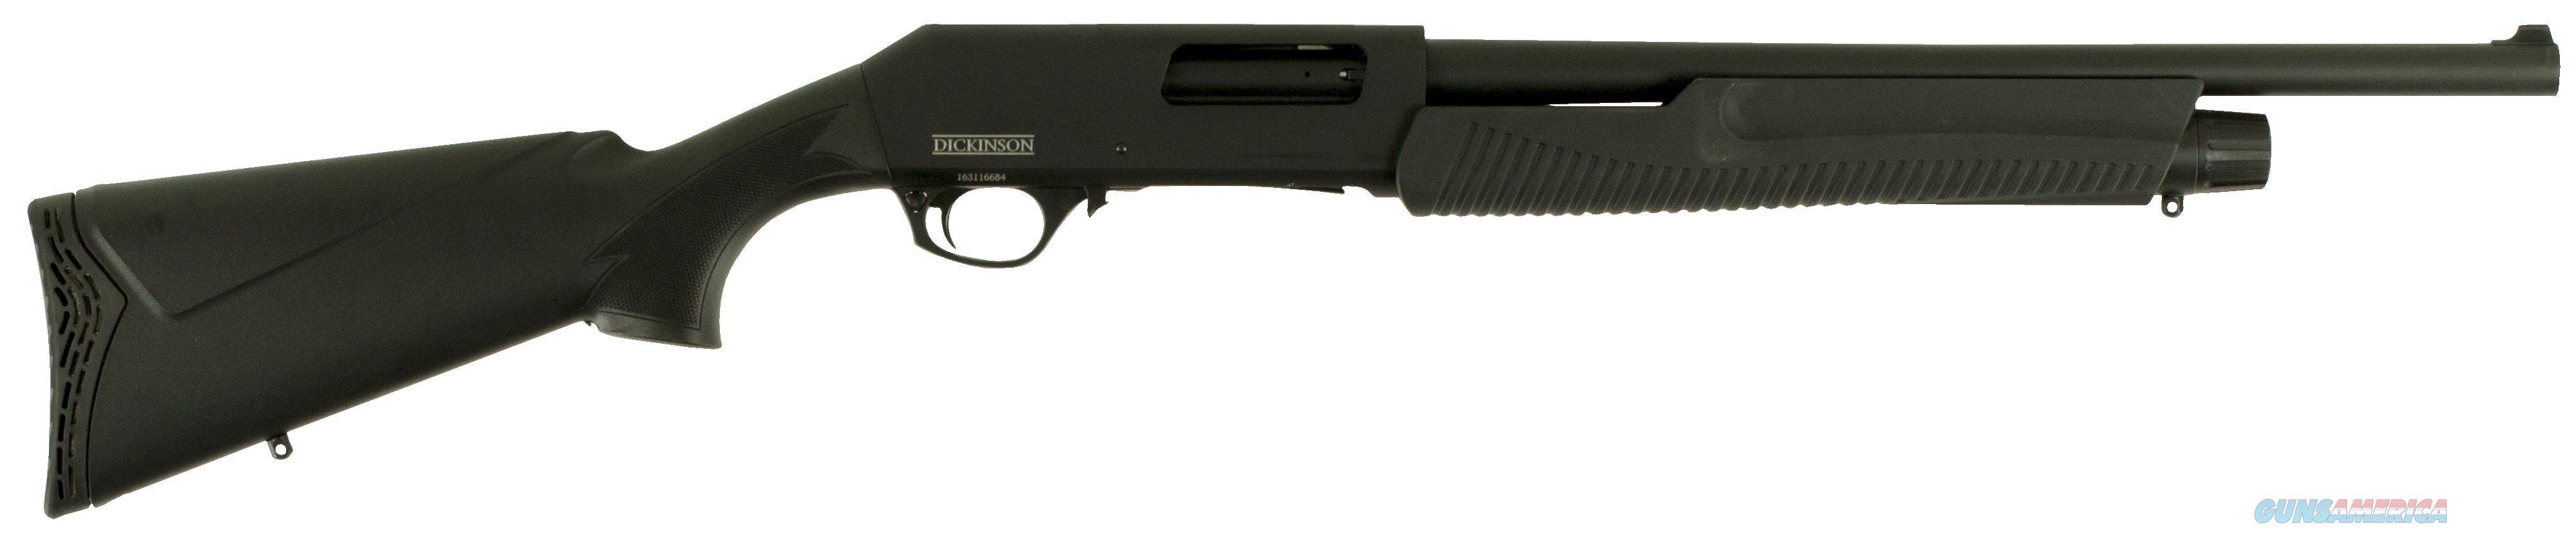 "Dickinson Xx3b2 Defense Pump 12 Gauge 18.5"" 3"" 5+1 Synthetic Black XX3B2  Guns > Shotguns > D Misc Shotguns"